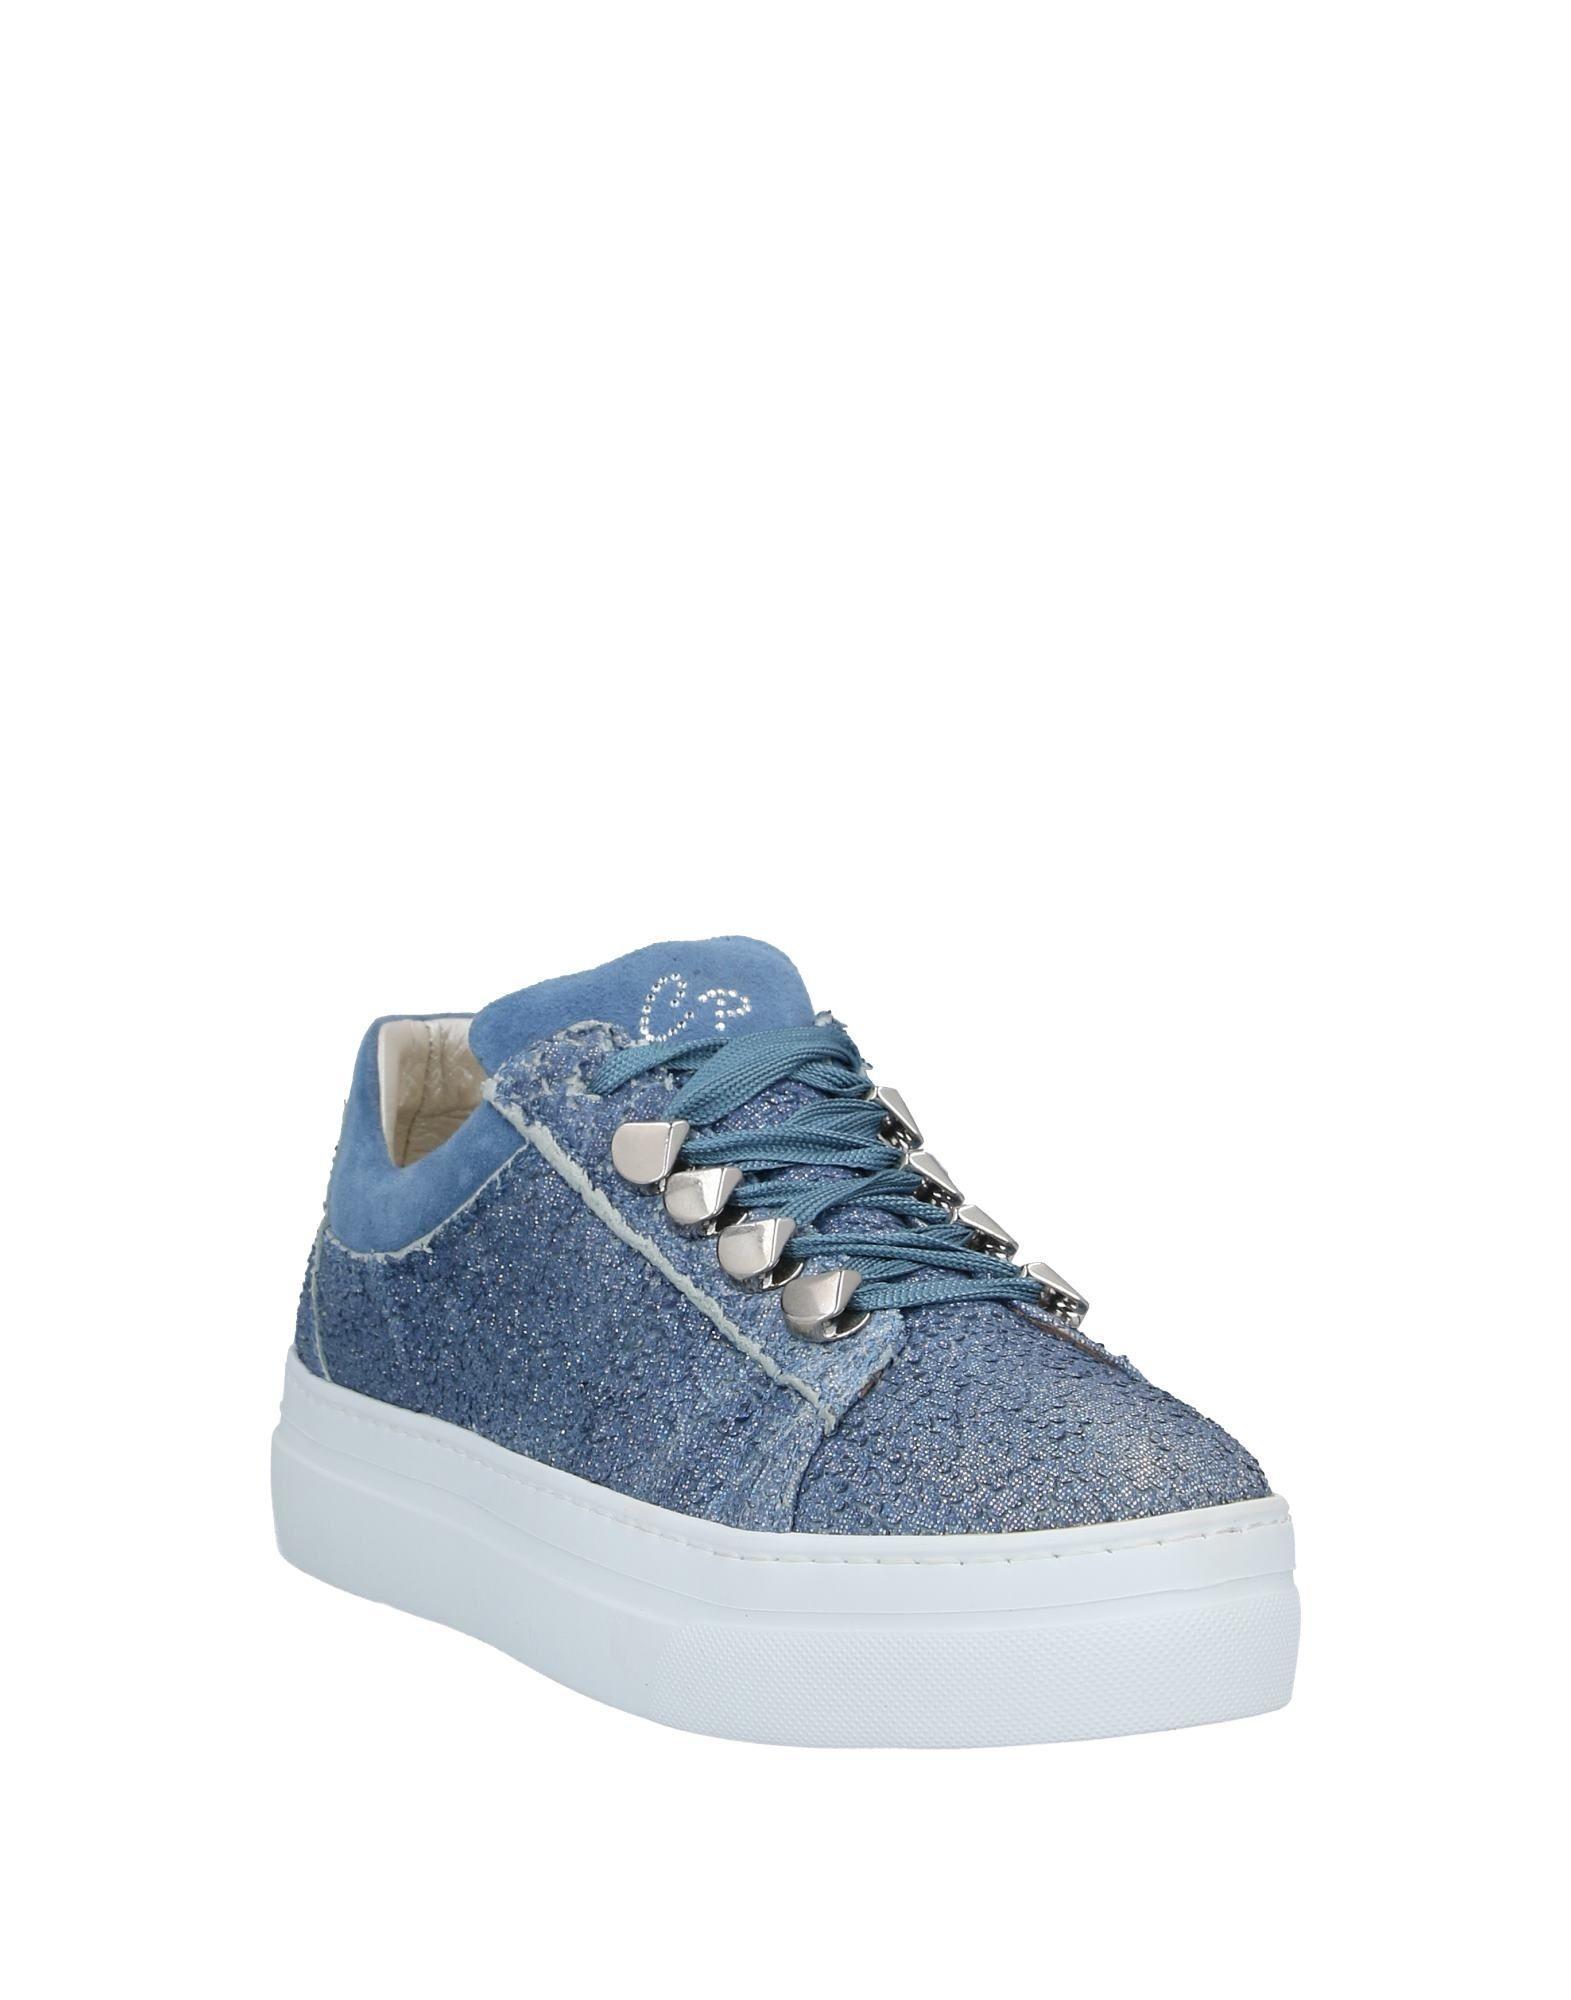 Sneakers & Deportivas Cesare Paciotti de Ante de color Azul